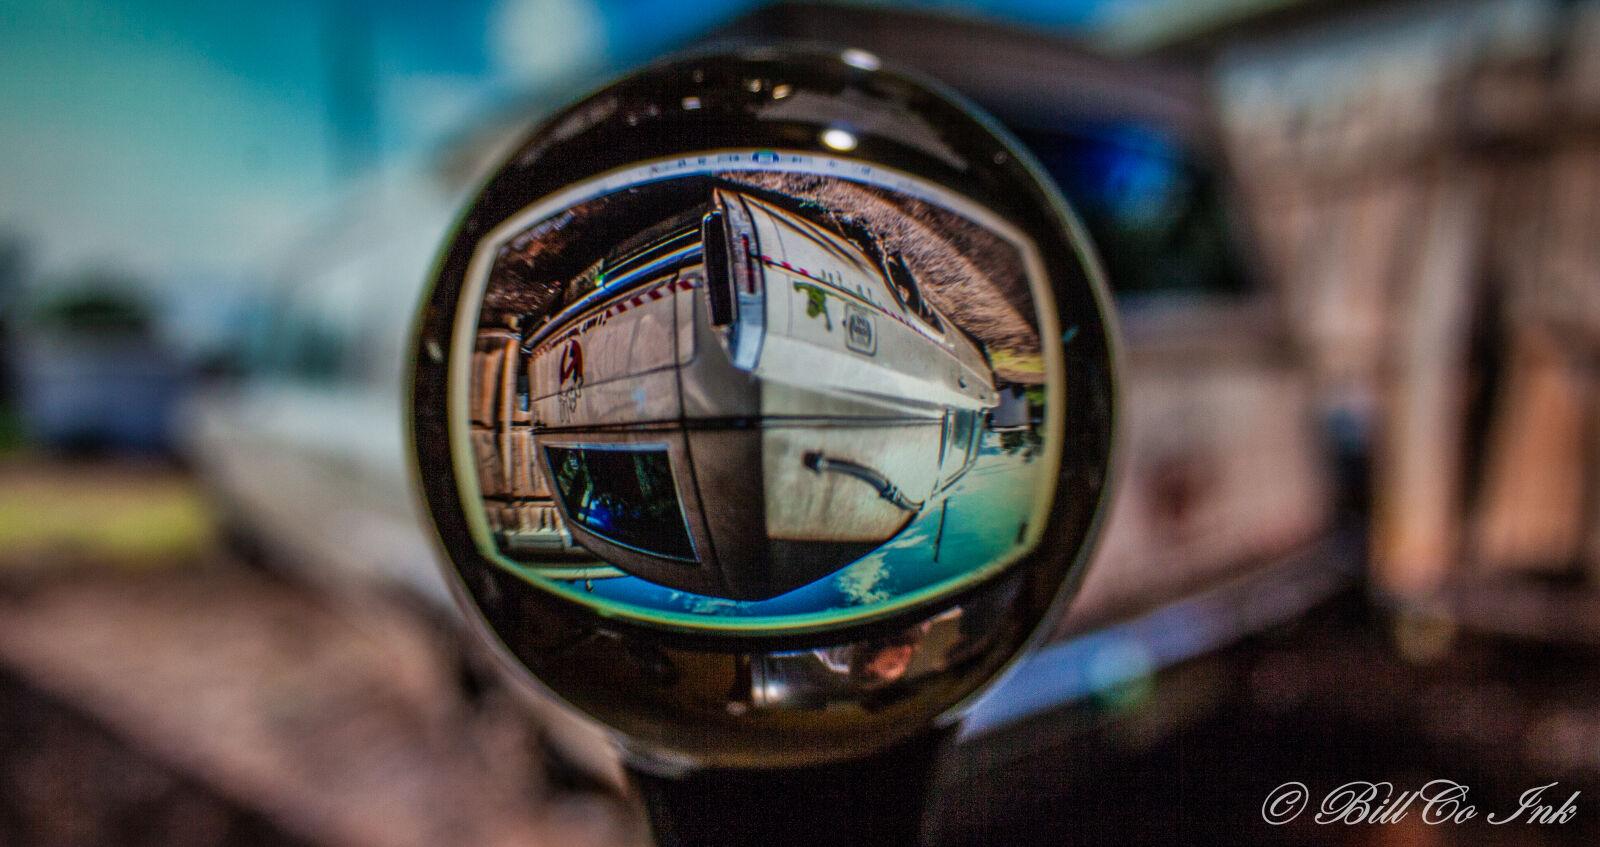 Canon EOS 5D Mark II sample photo